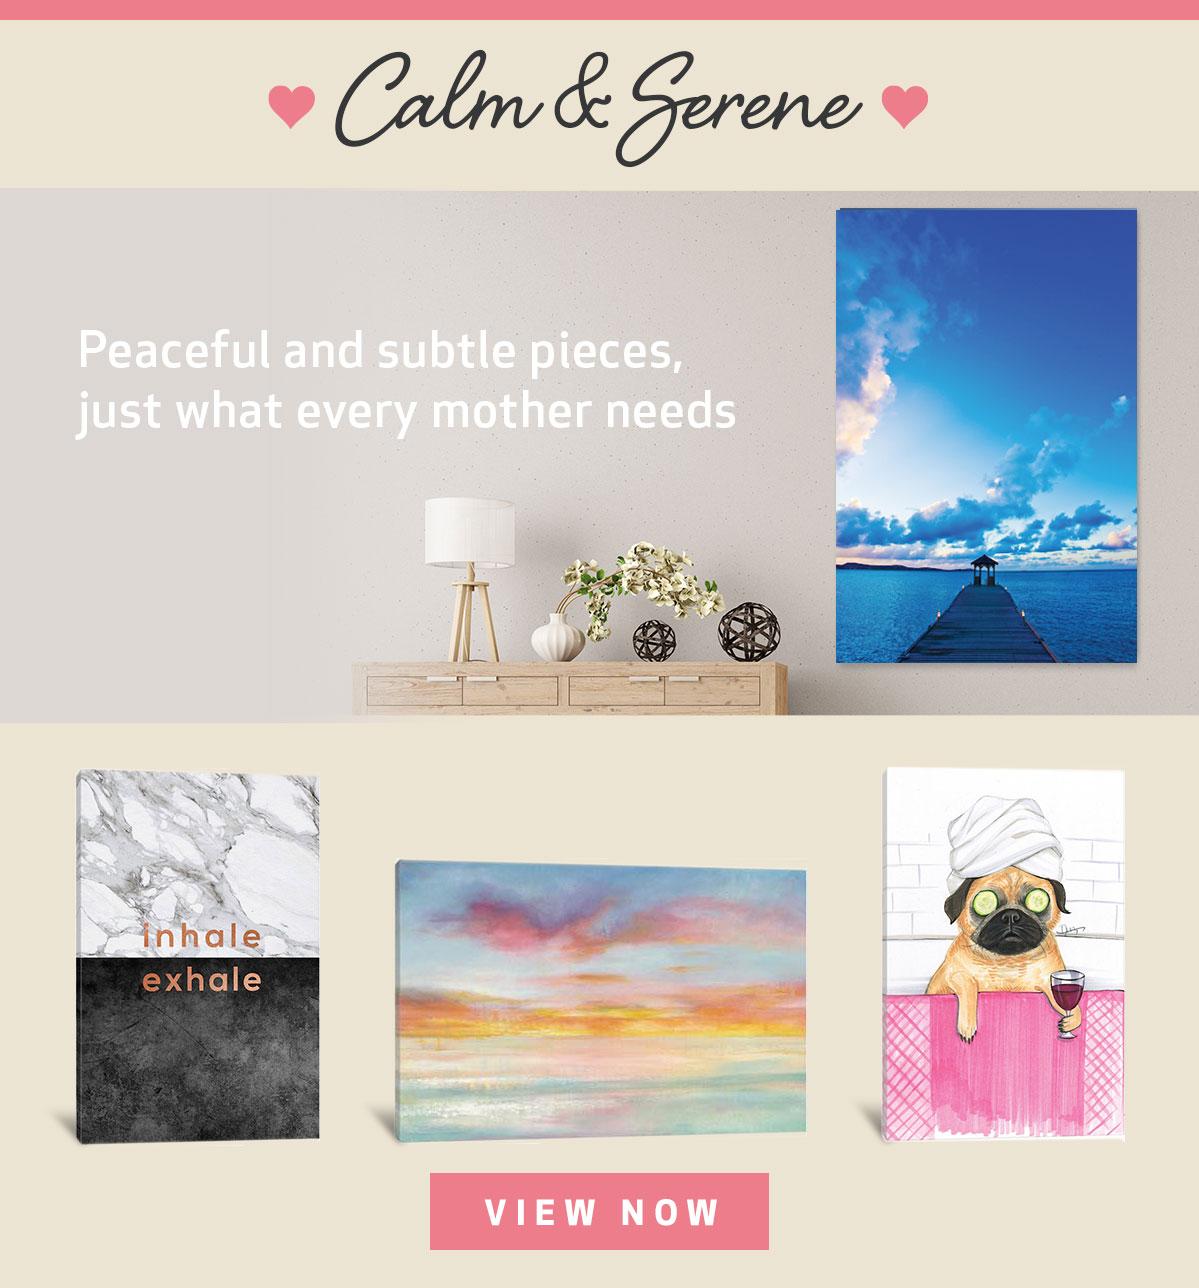 Calm & Serene